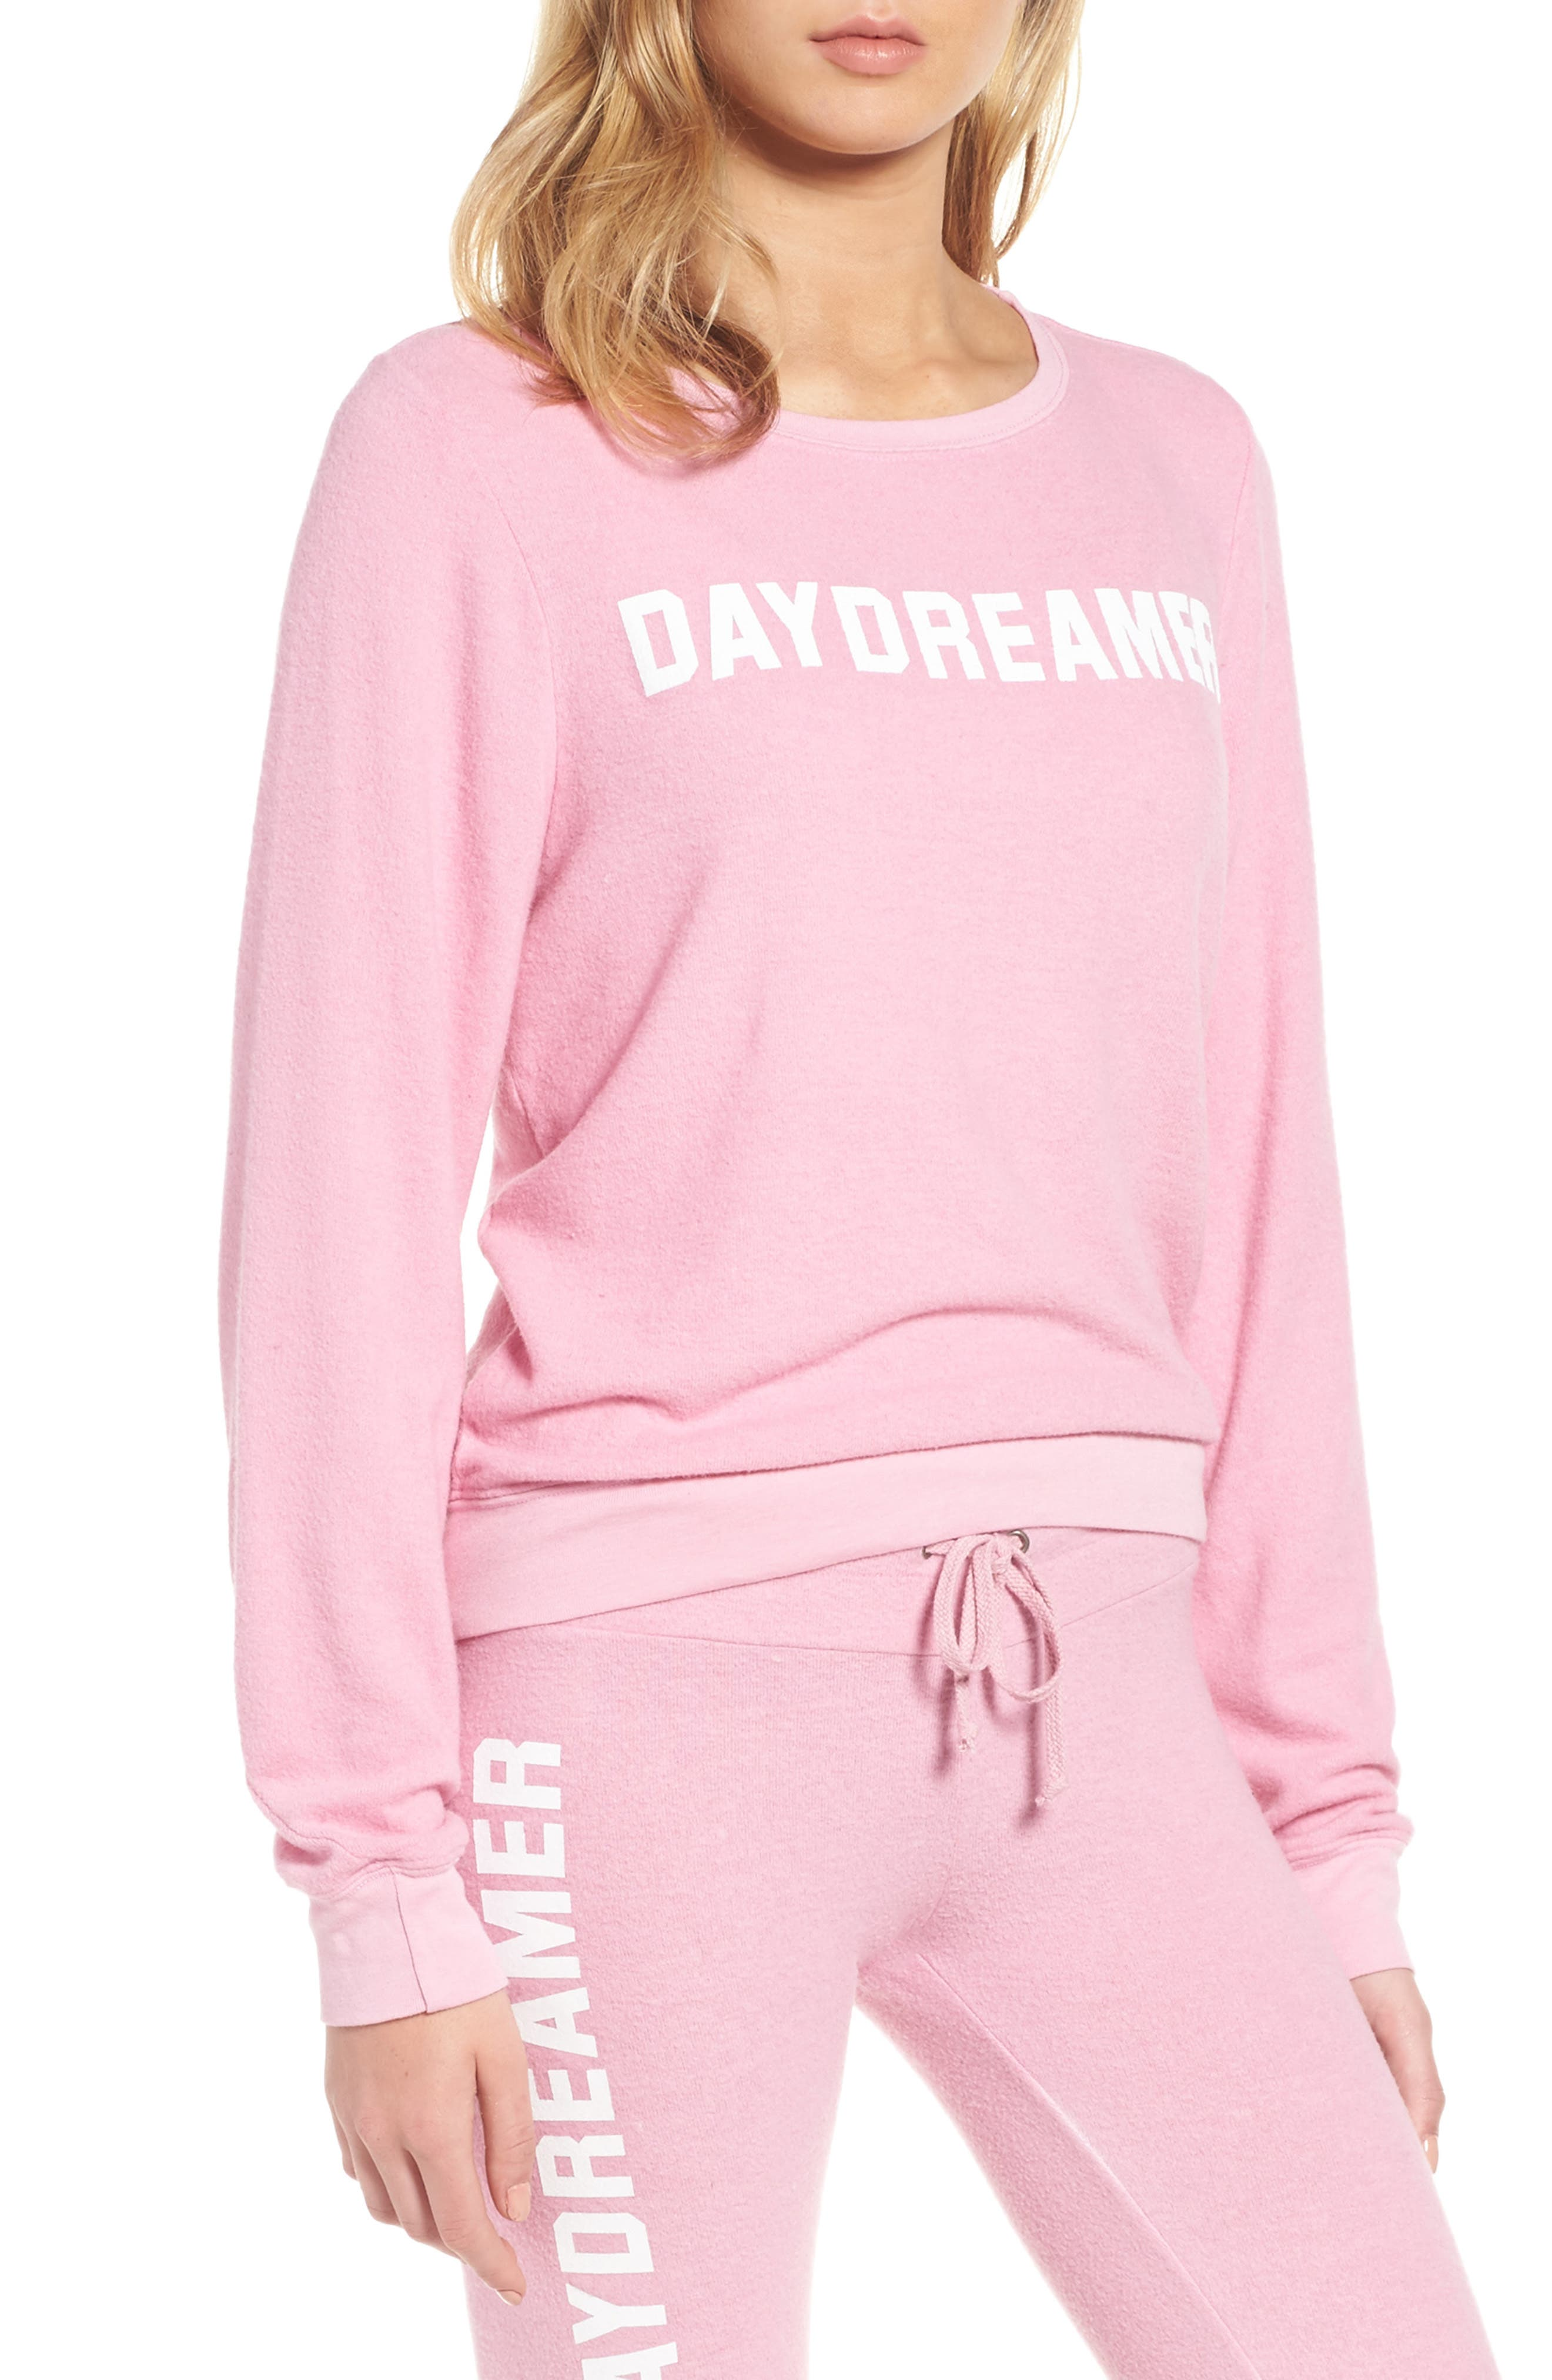 Daydreamer Sweatshirt,                             Main thumbnail 1, color,                             650